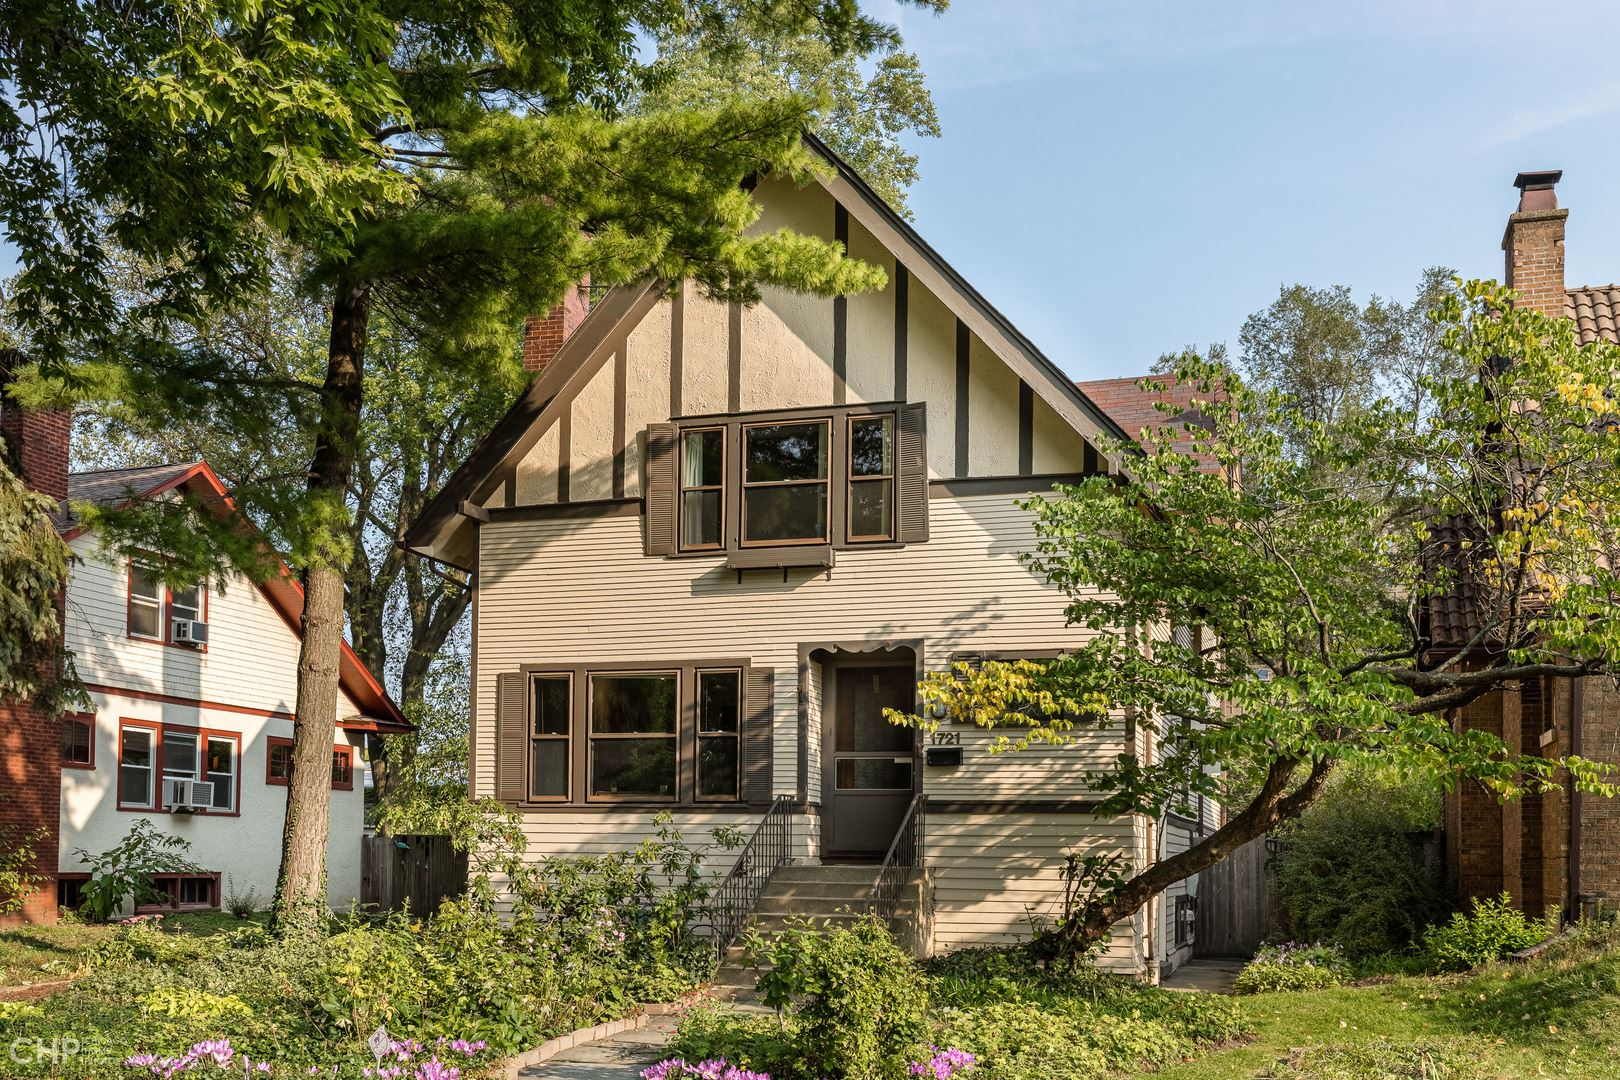 Photo for 1721 Harrison Street, Evanston, IL 60201 (MLS # 10904280)